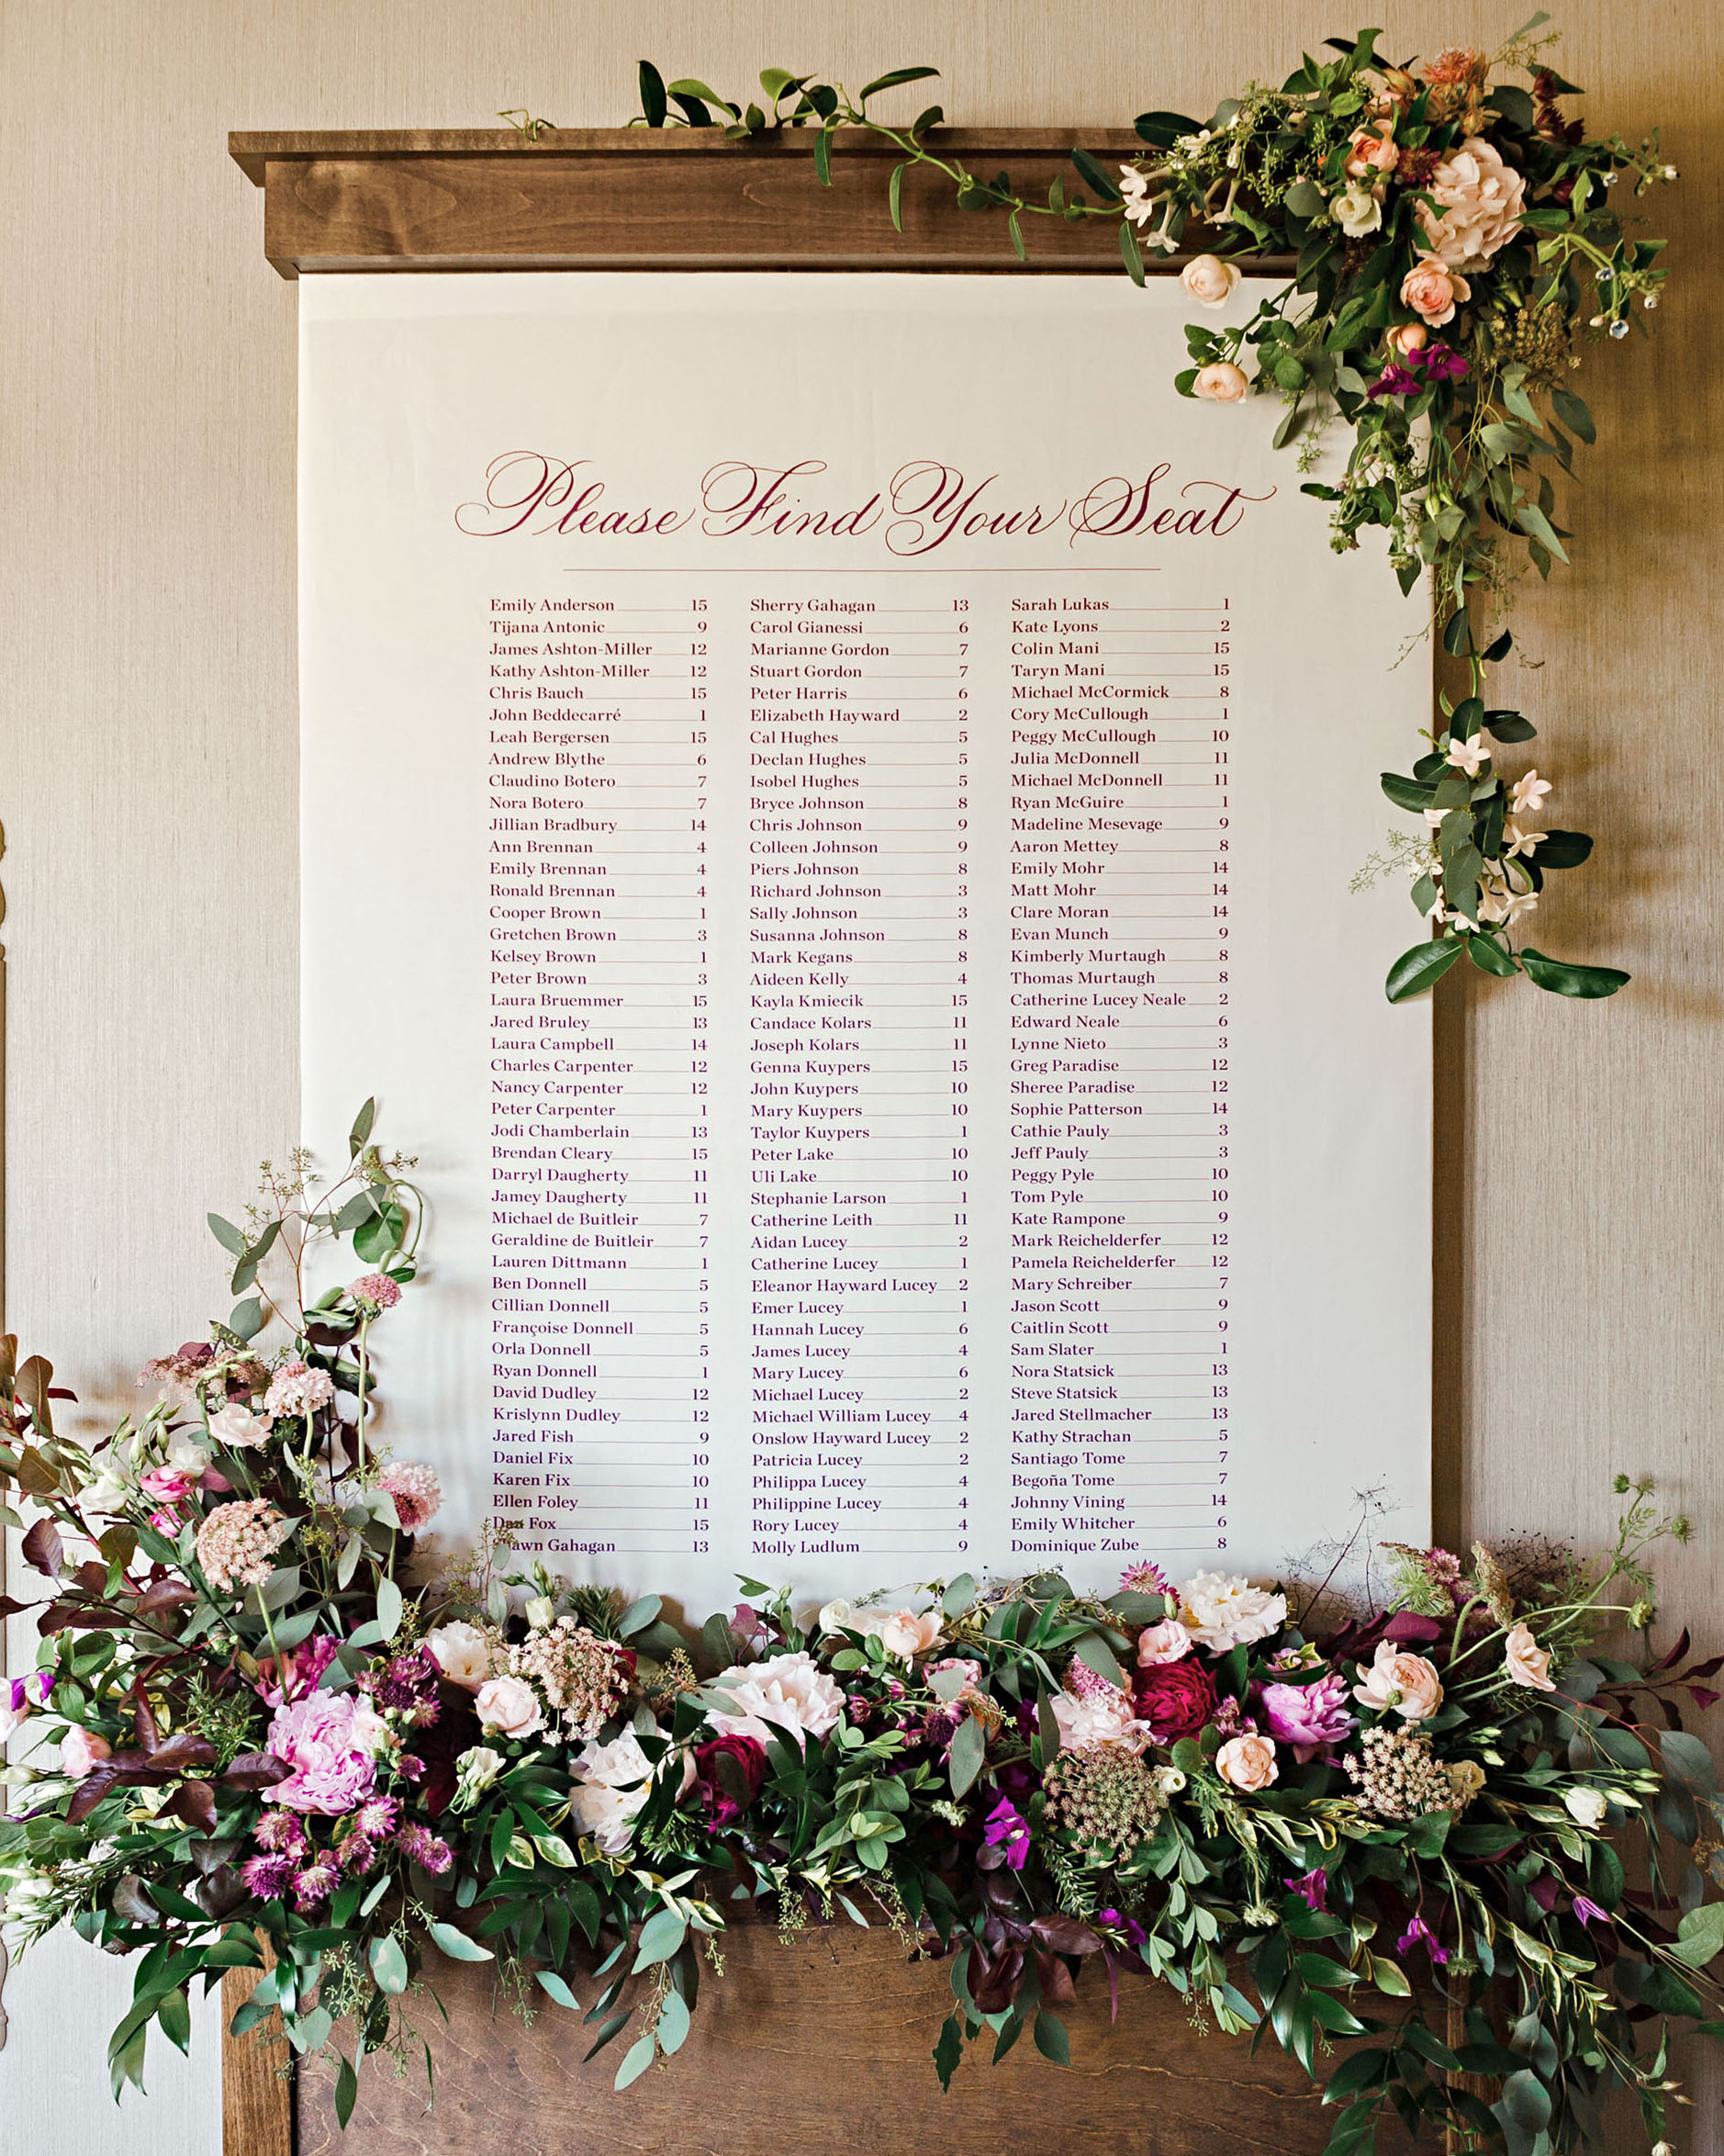 emer cooper wedding wisconsin seating chart